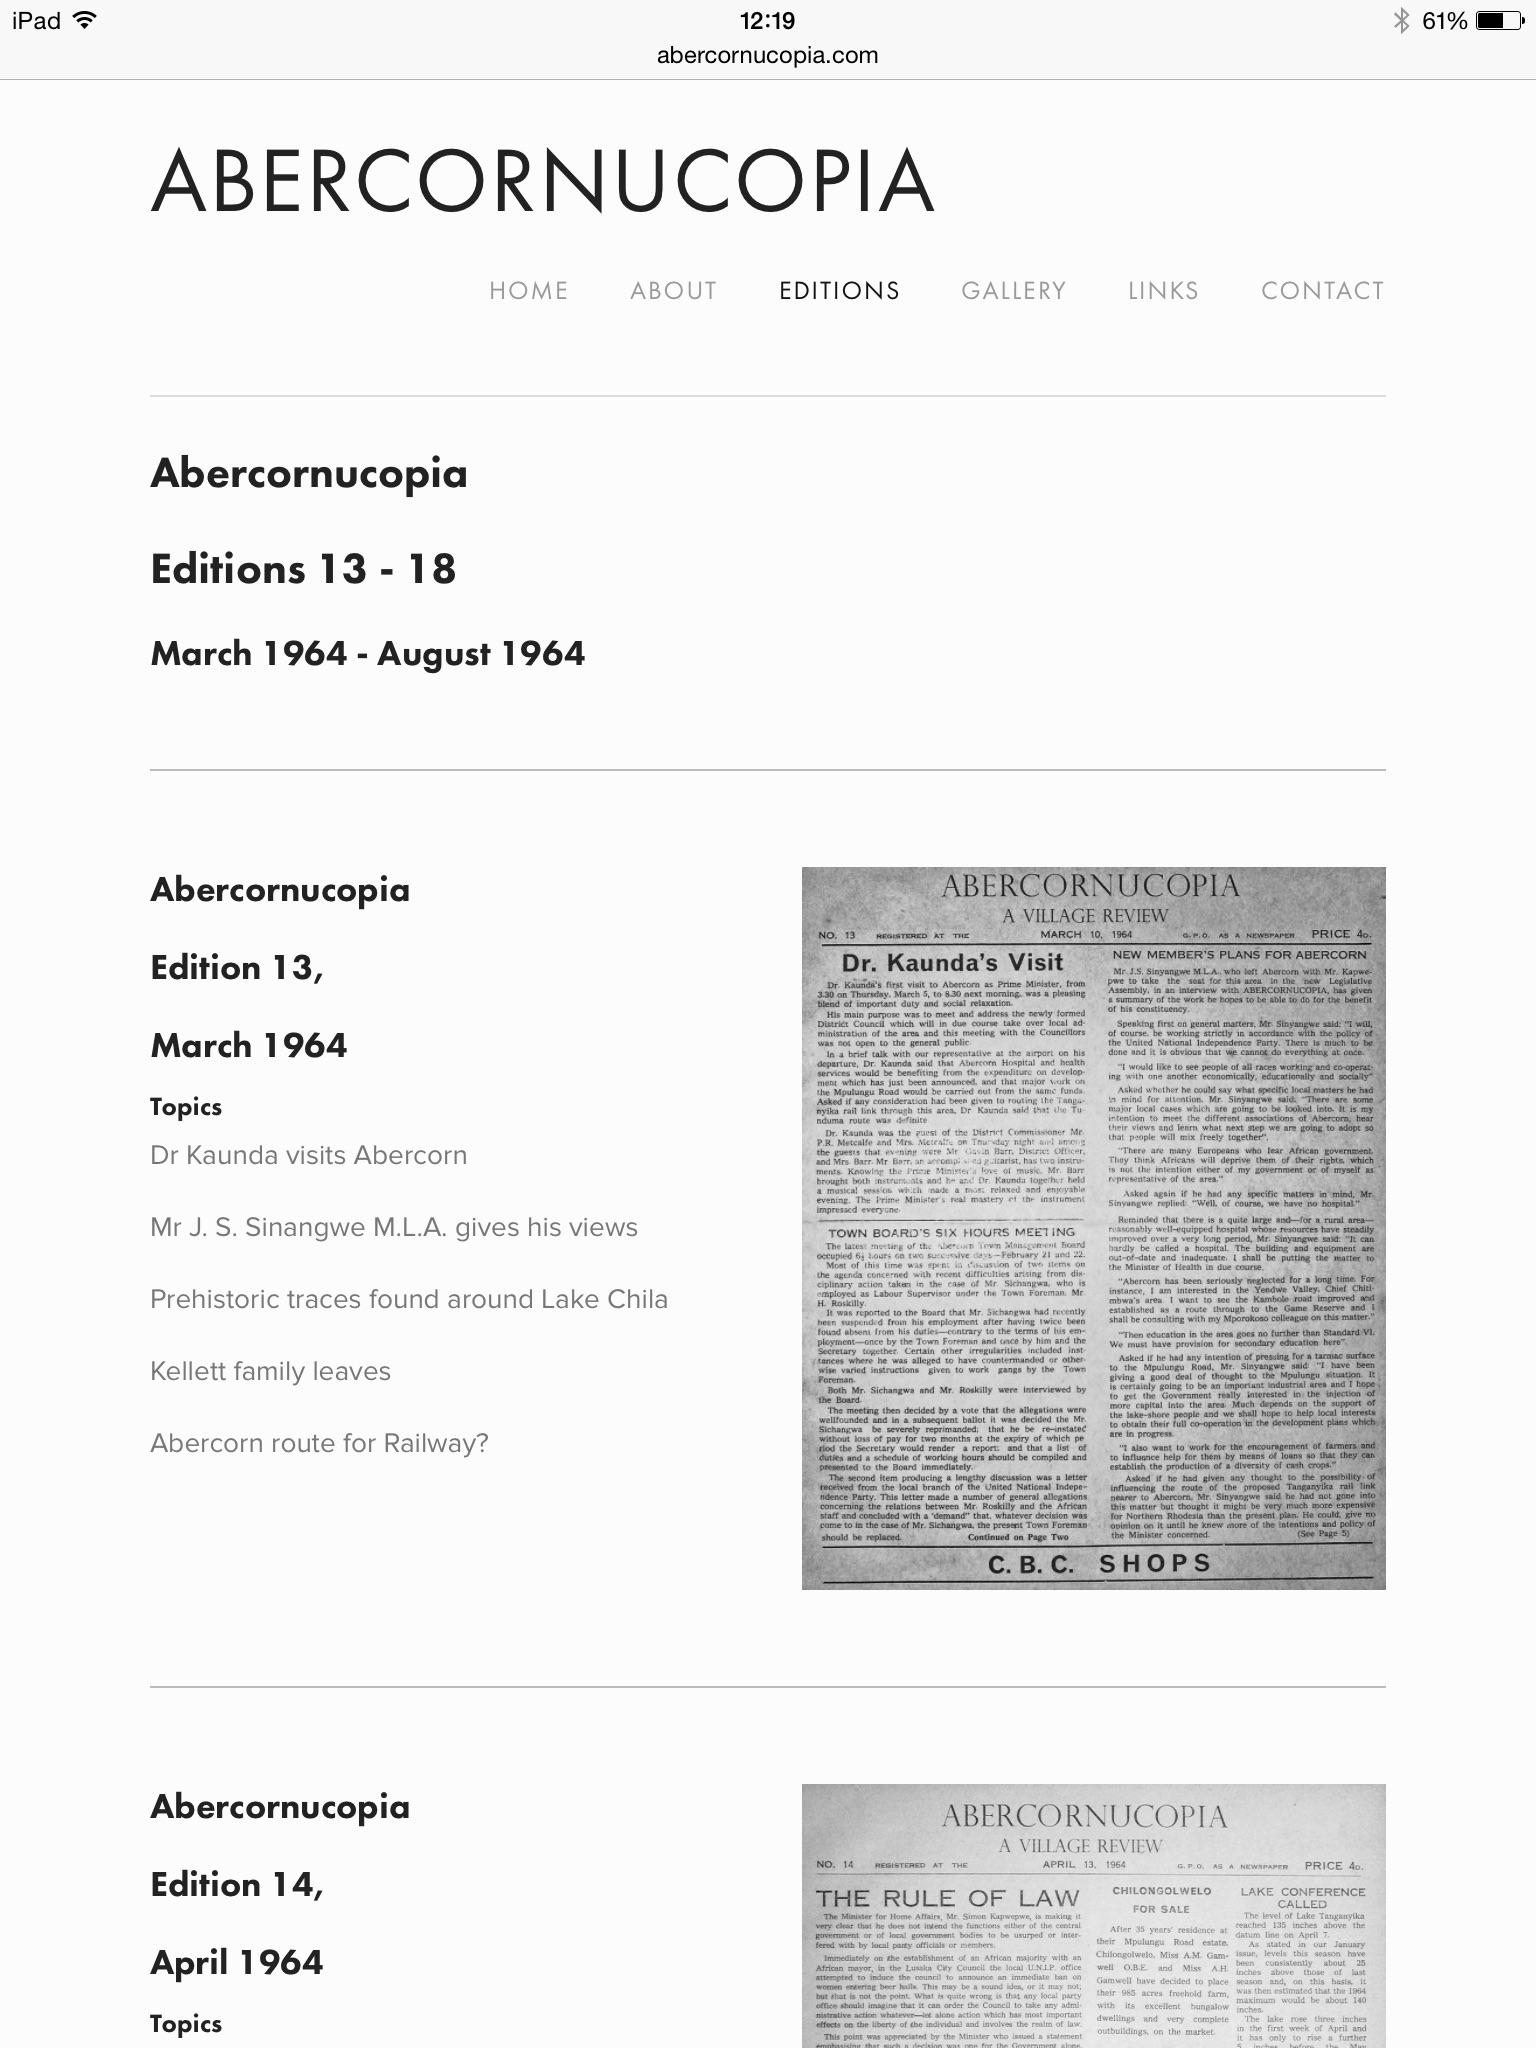 Abercornucopia, newspaper editions available to explore online